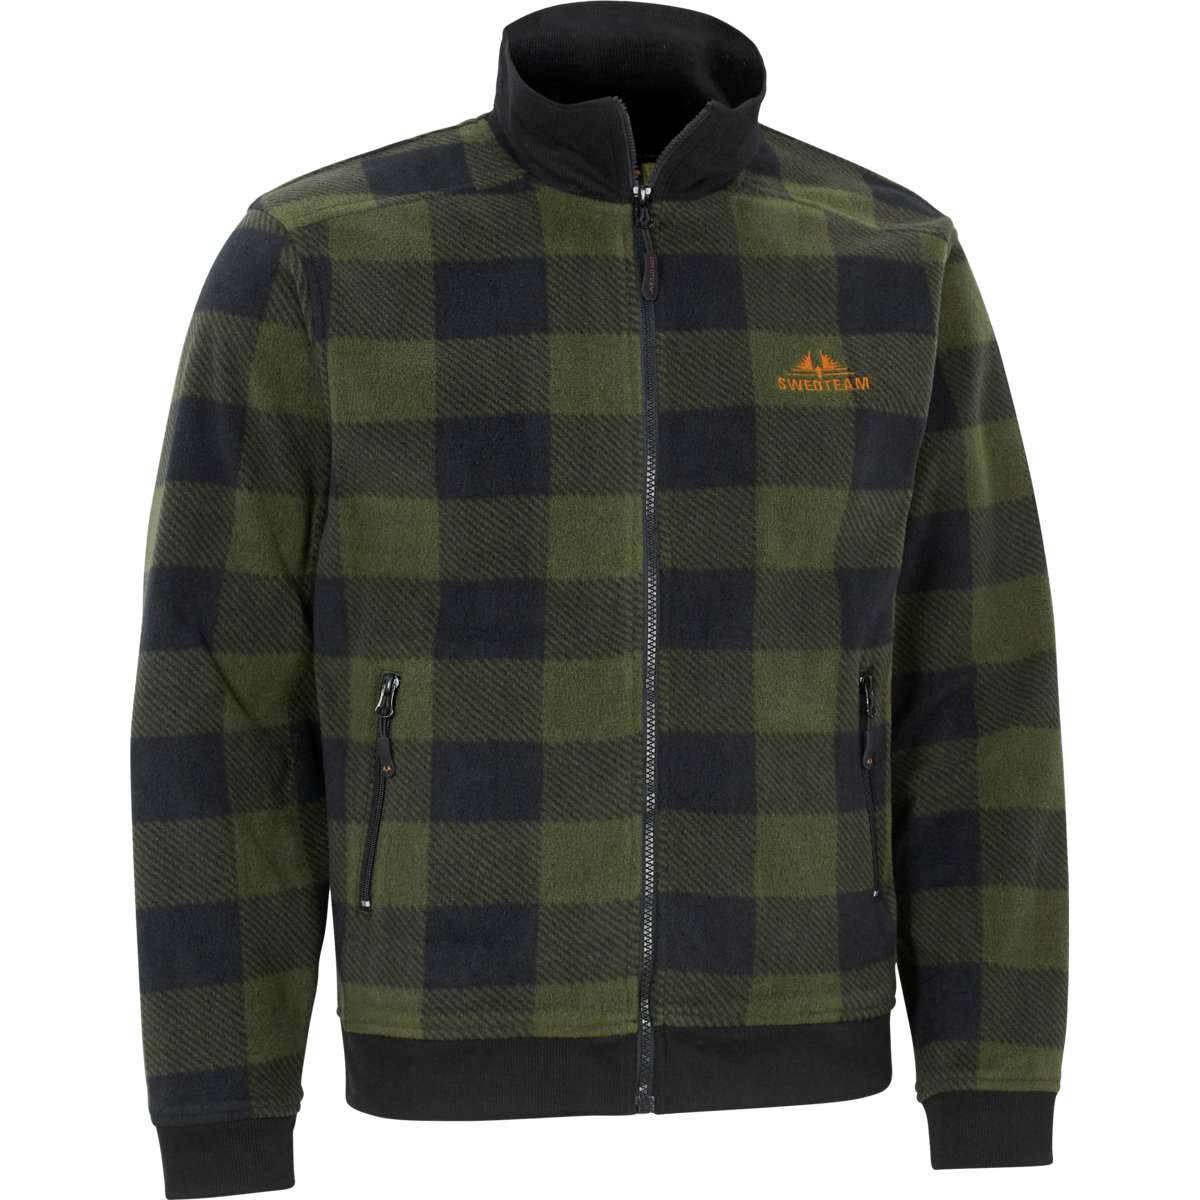 Swedteam Lynx M Sweater Full-zip Green